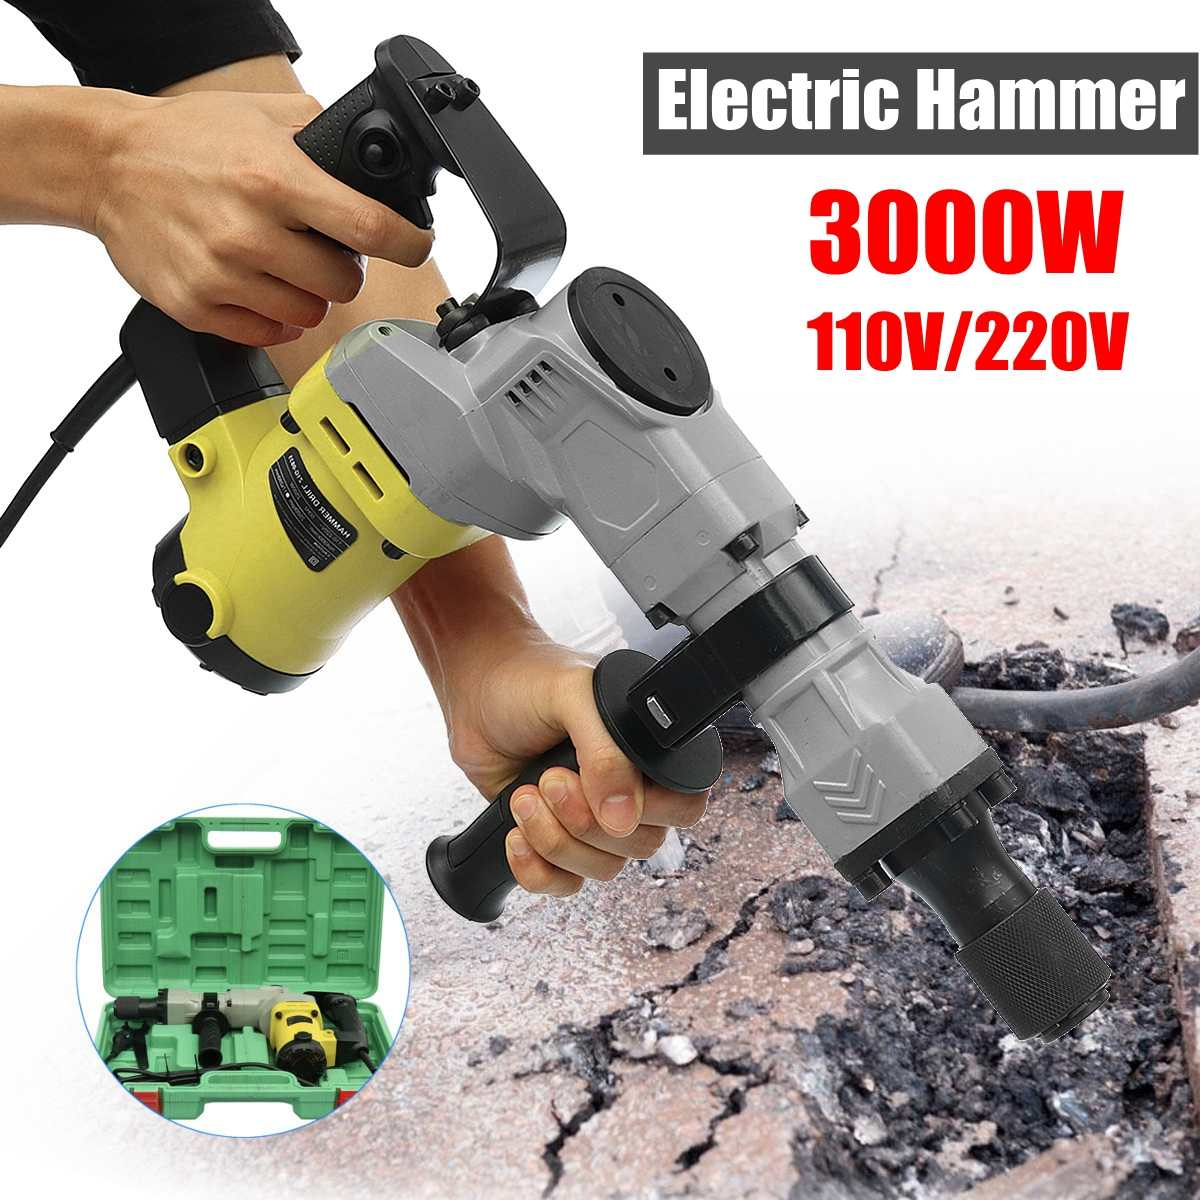 110/220 V 電気ドリル 3000 ワット 3000BPM 電気解体電気ハンマードリルコンクリートブレーカパンチジャック 4500r/ 最小